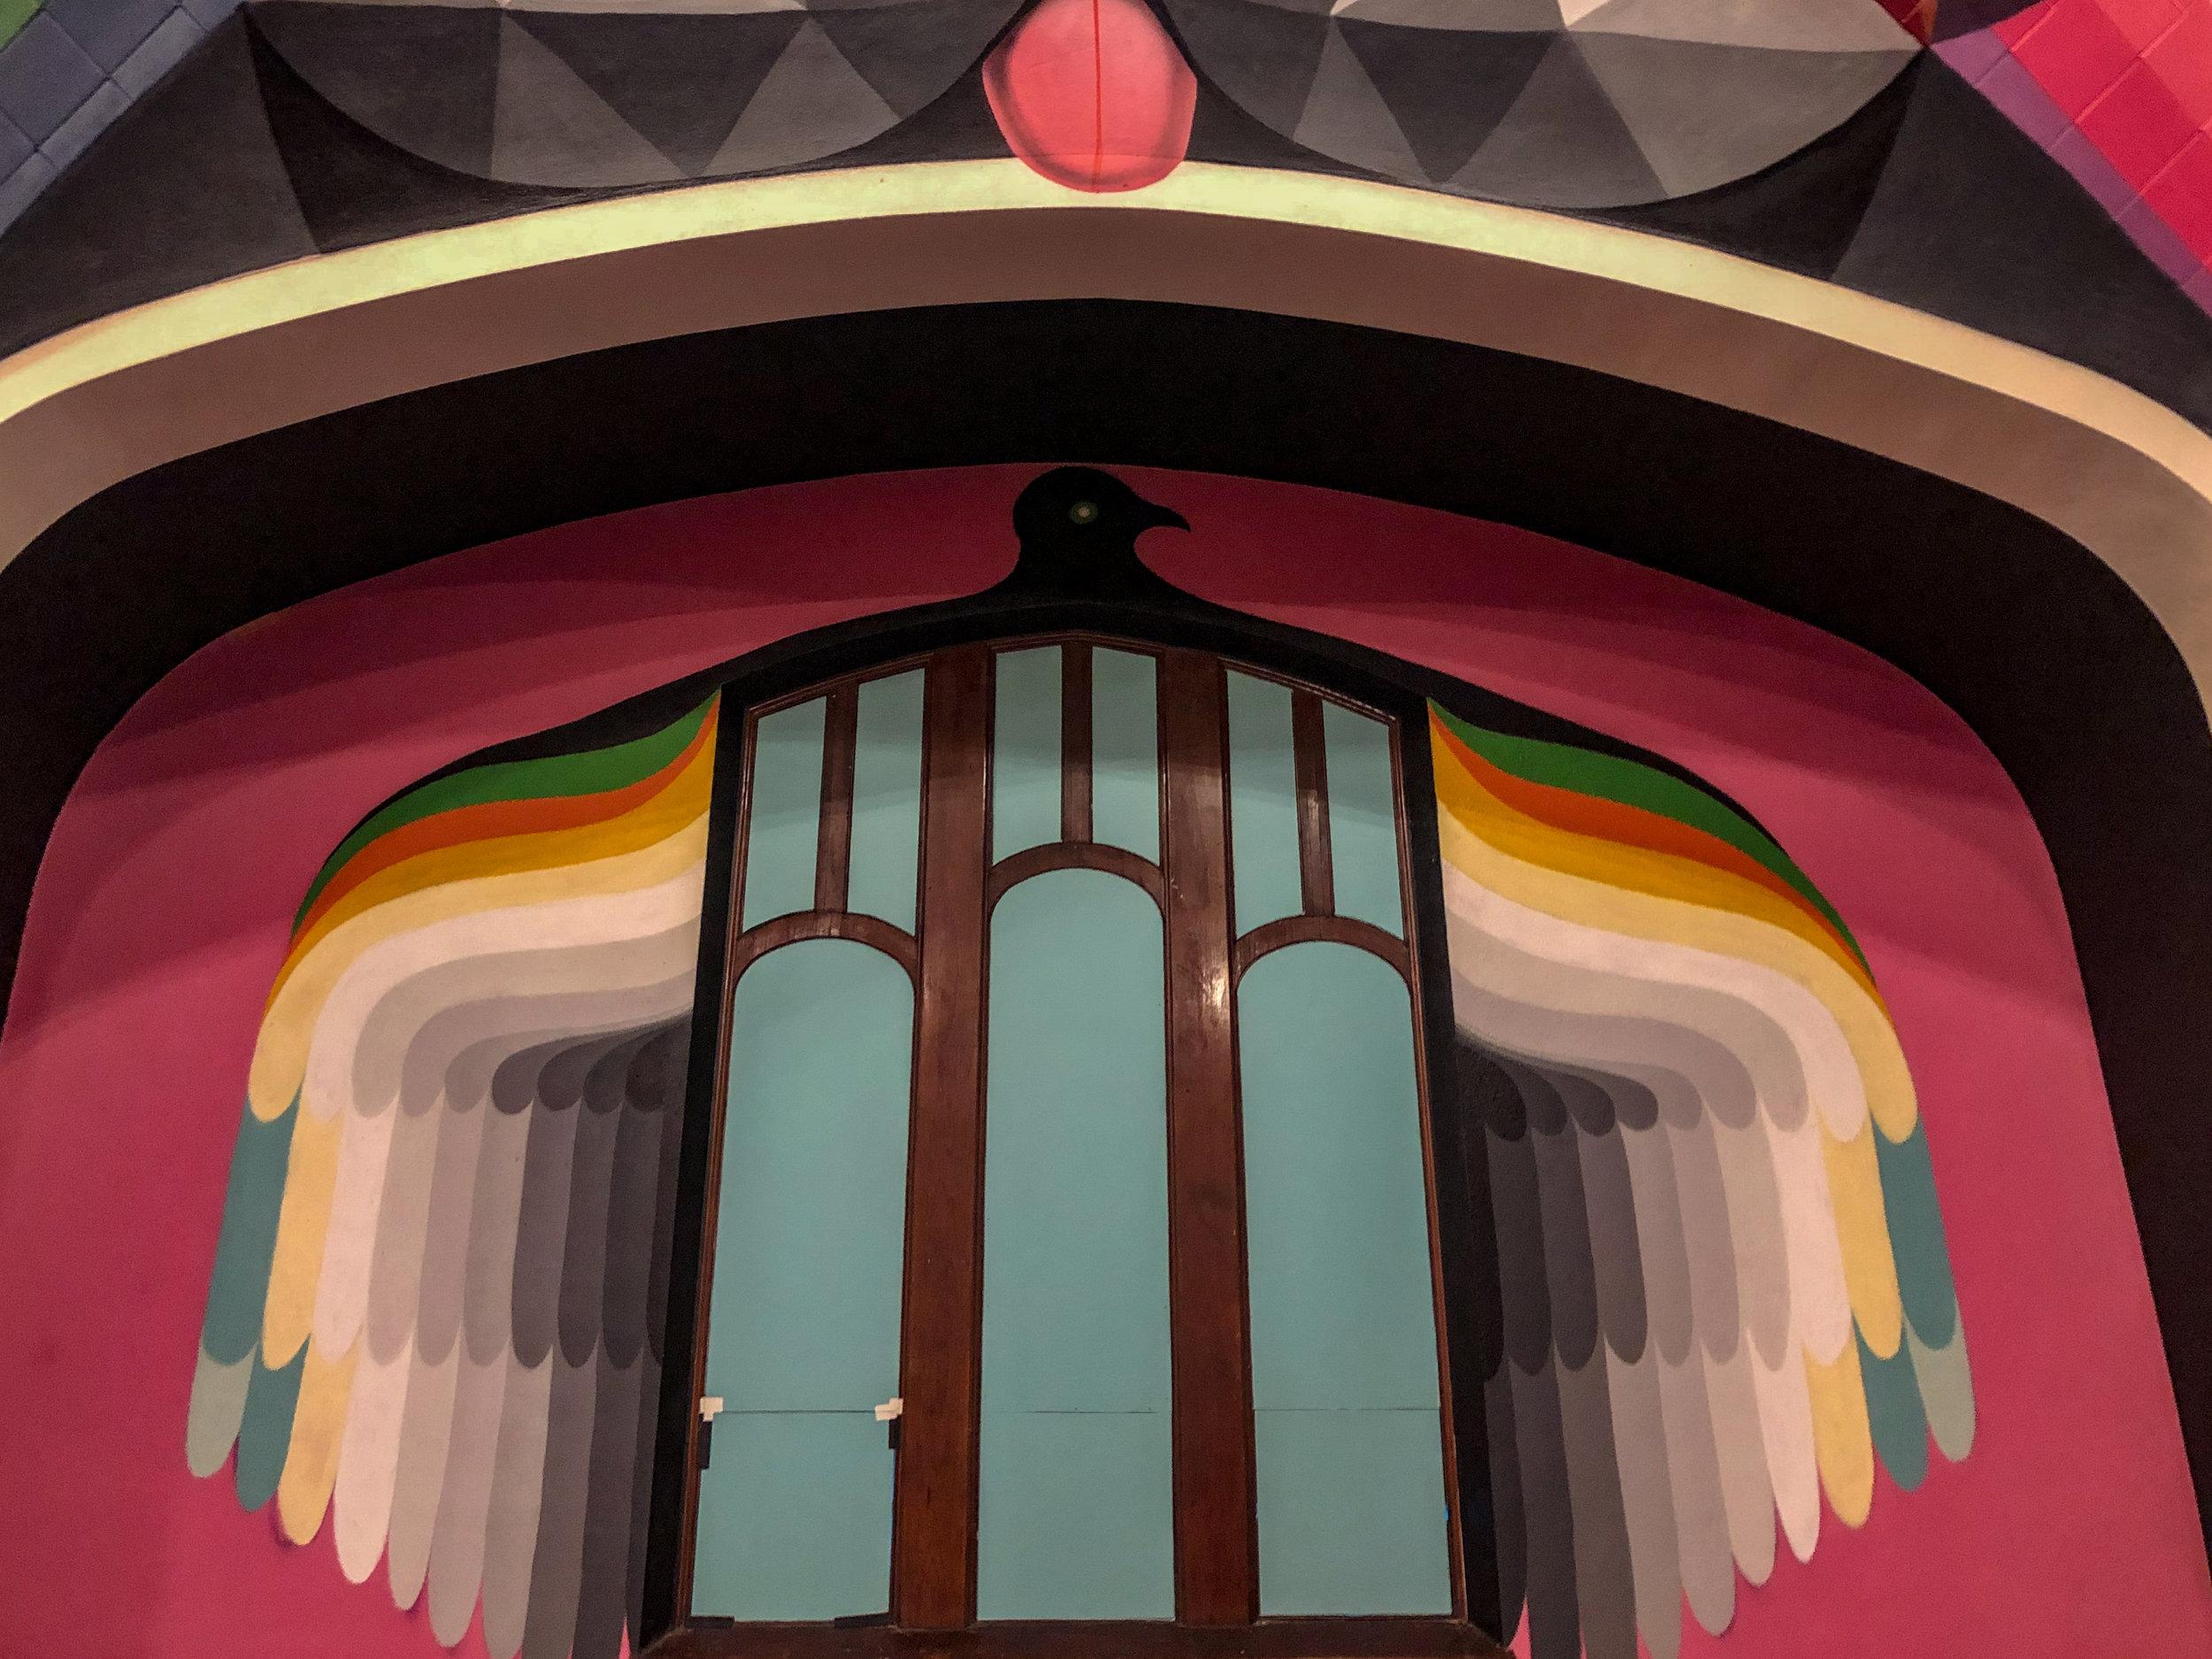 Okuda San Miguels grayscale artwork above the soundboard